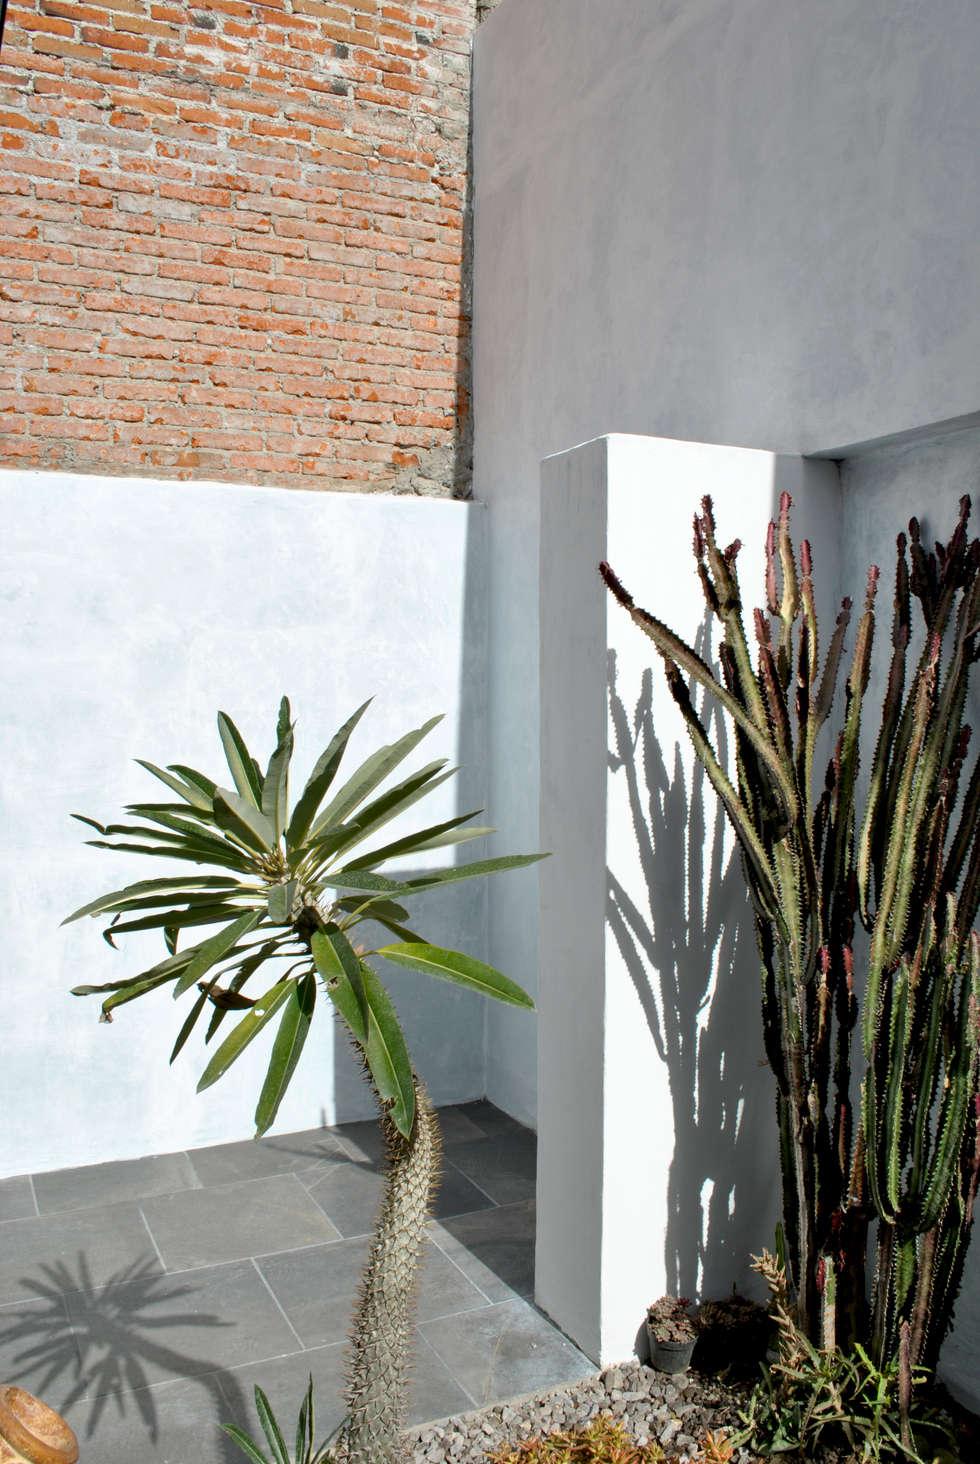 DETALLE ACCESO A BAÑO DE HOMBRES : Espacios comerciales de estilo  por Novhus Oficina de Arquitectura